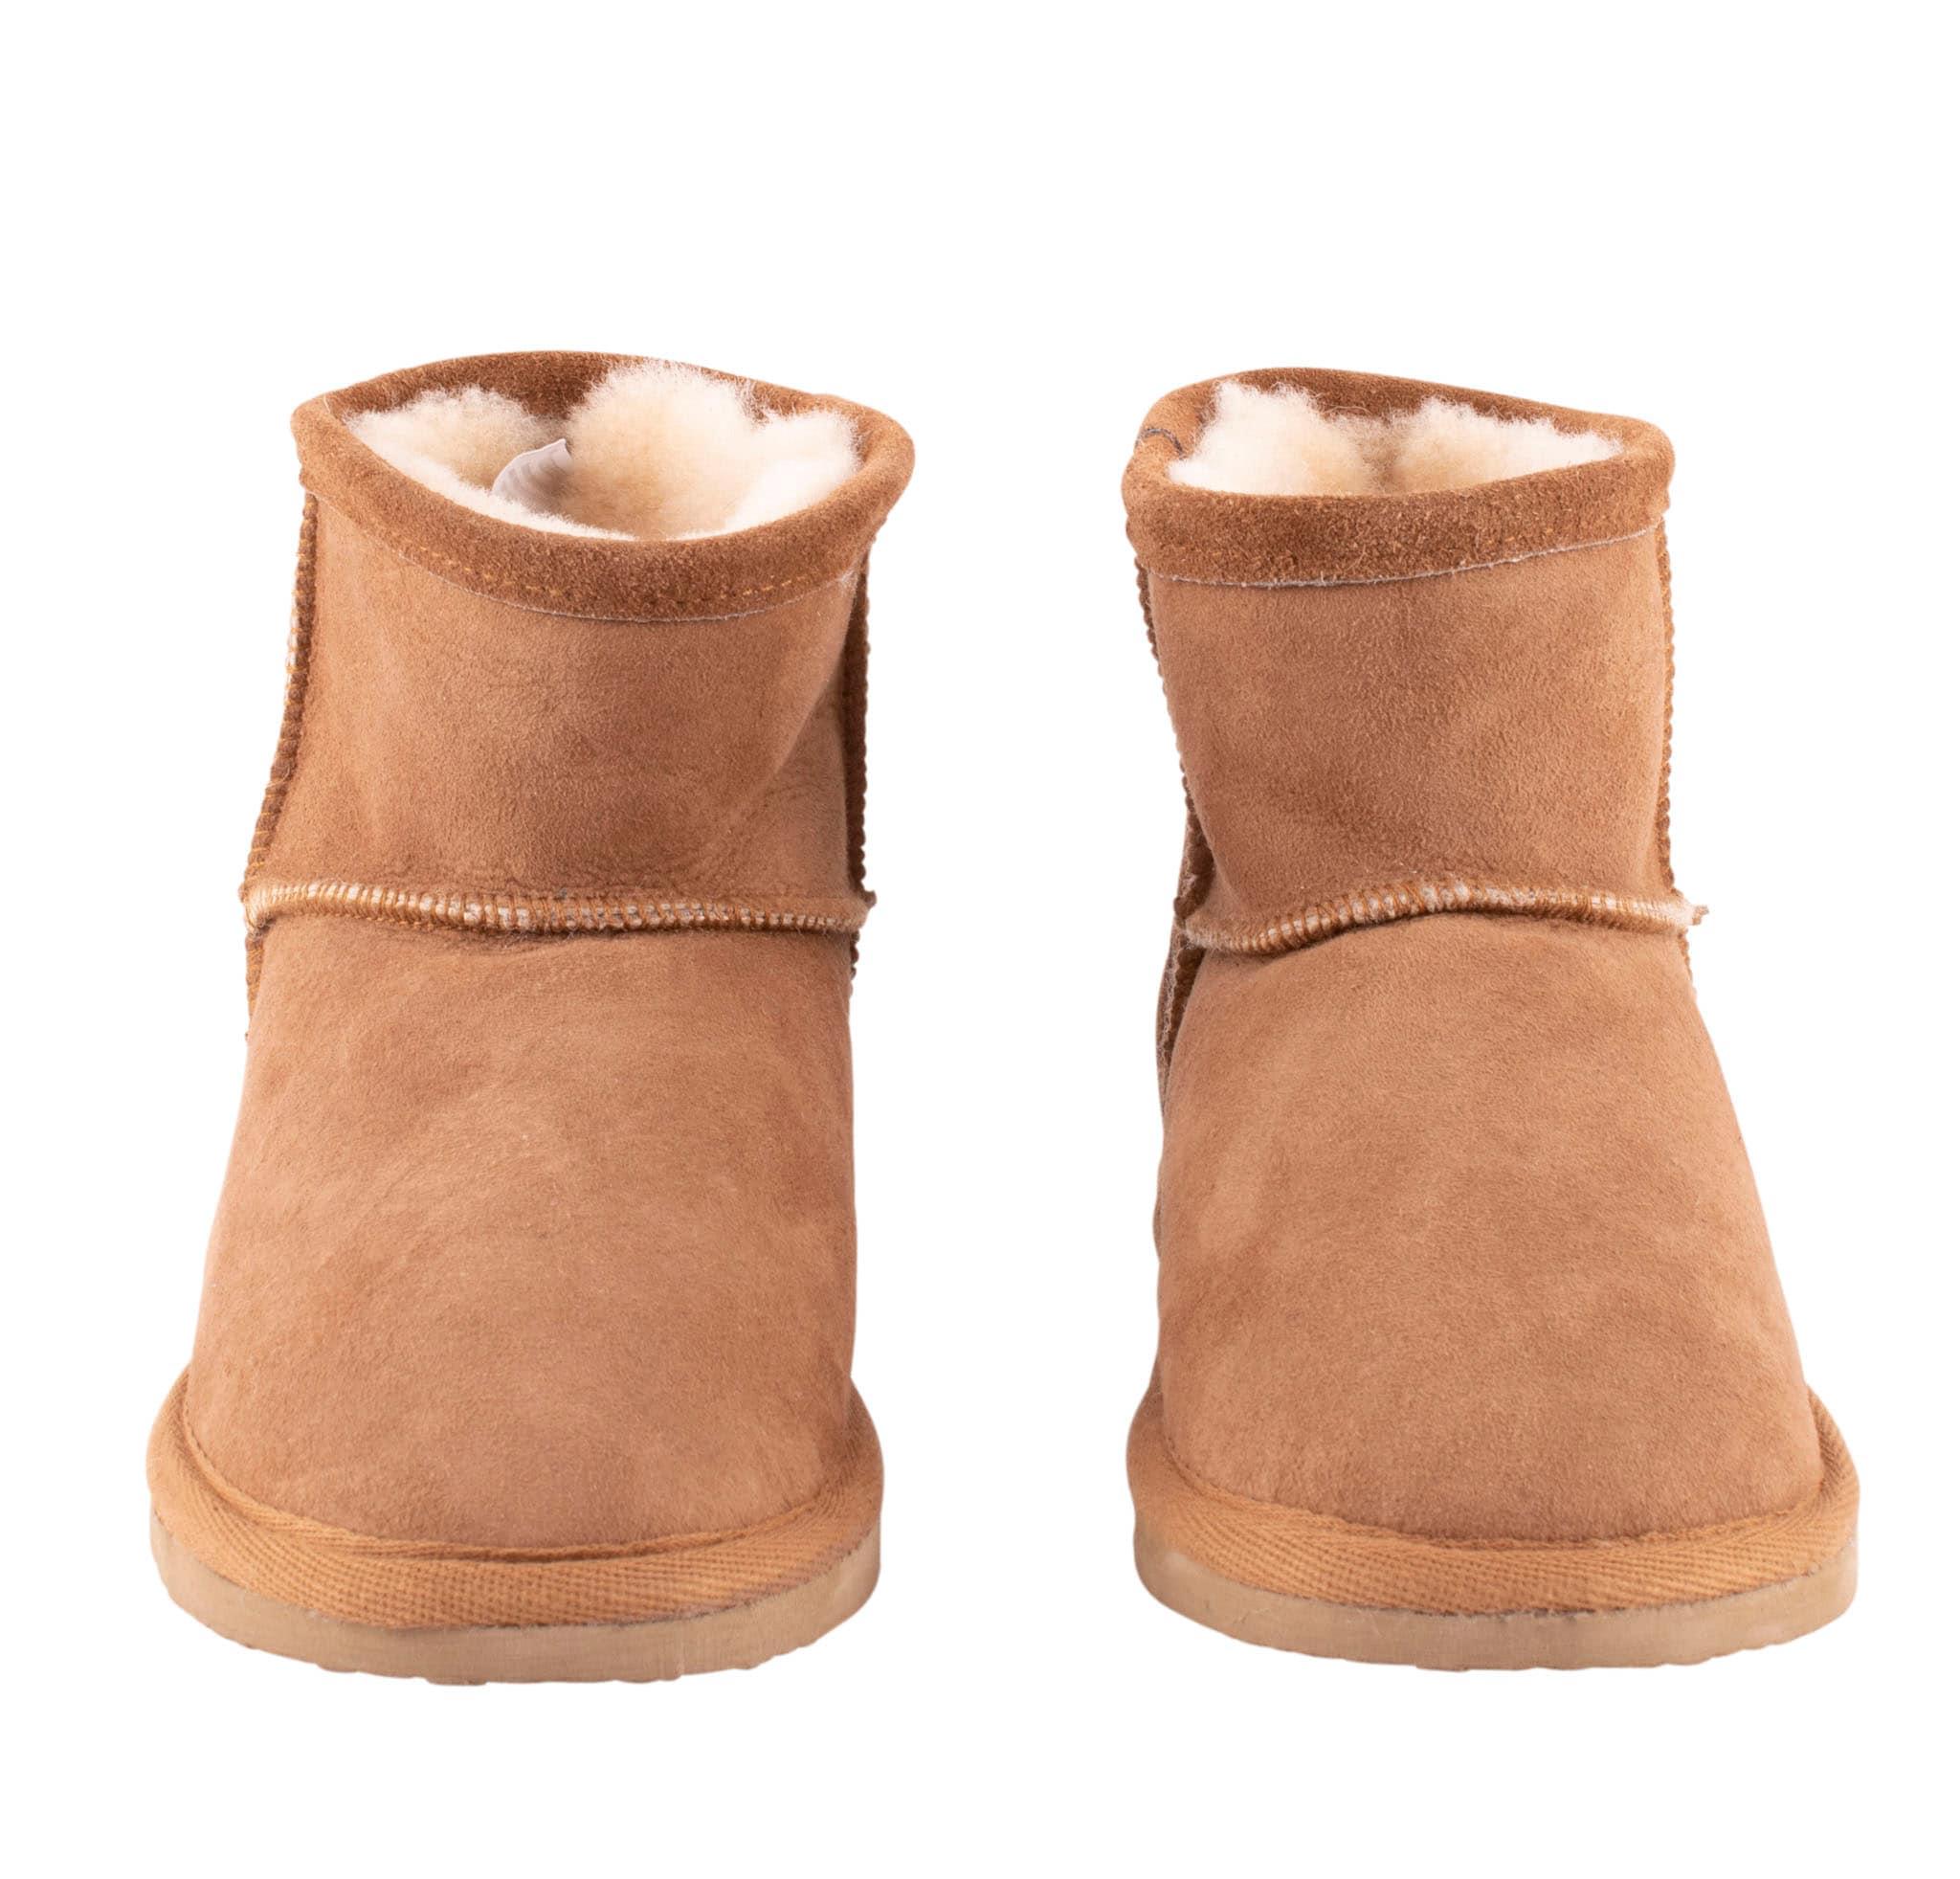 Mora ankel boots Chestnut